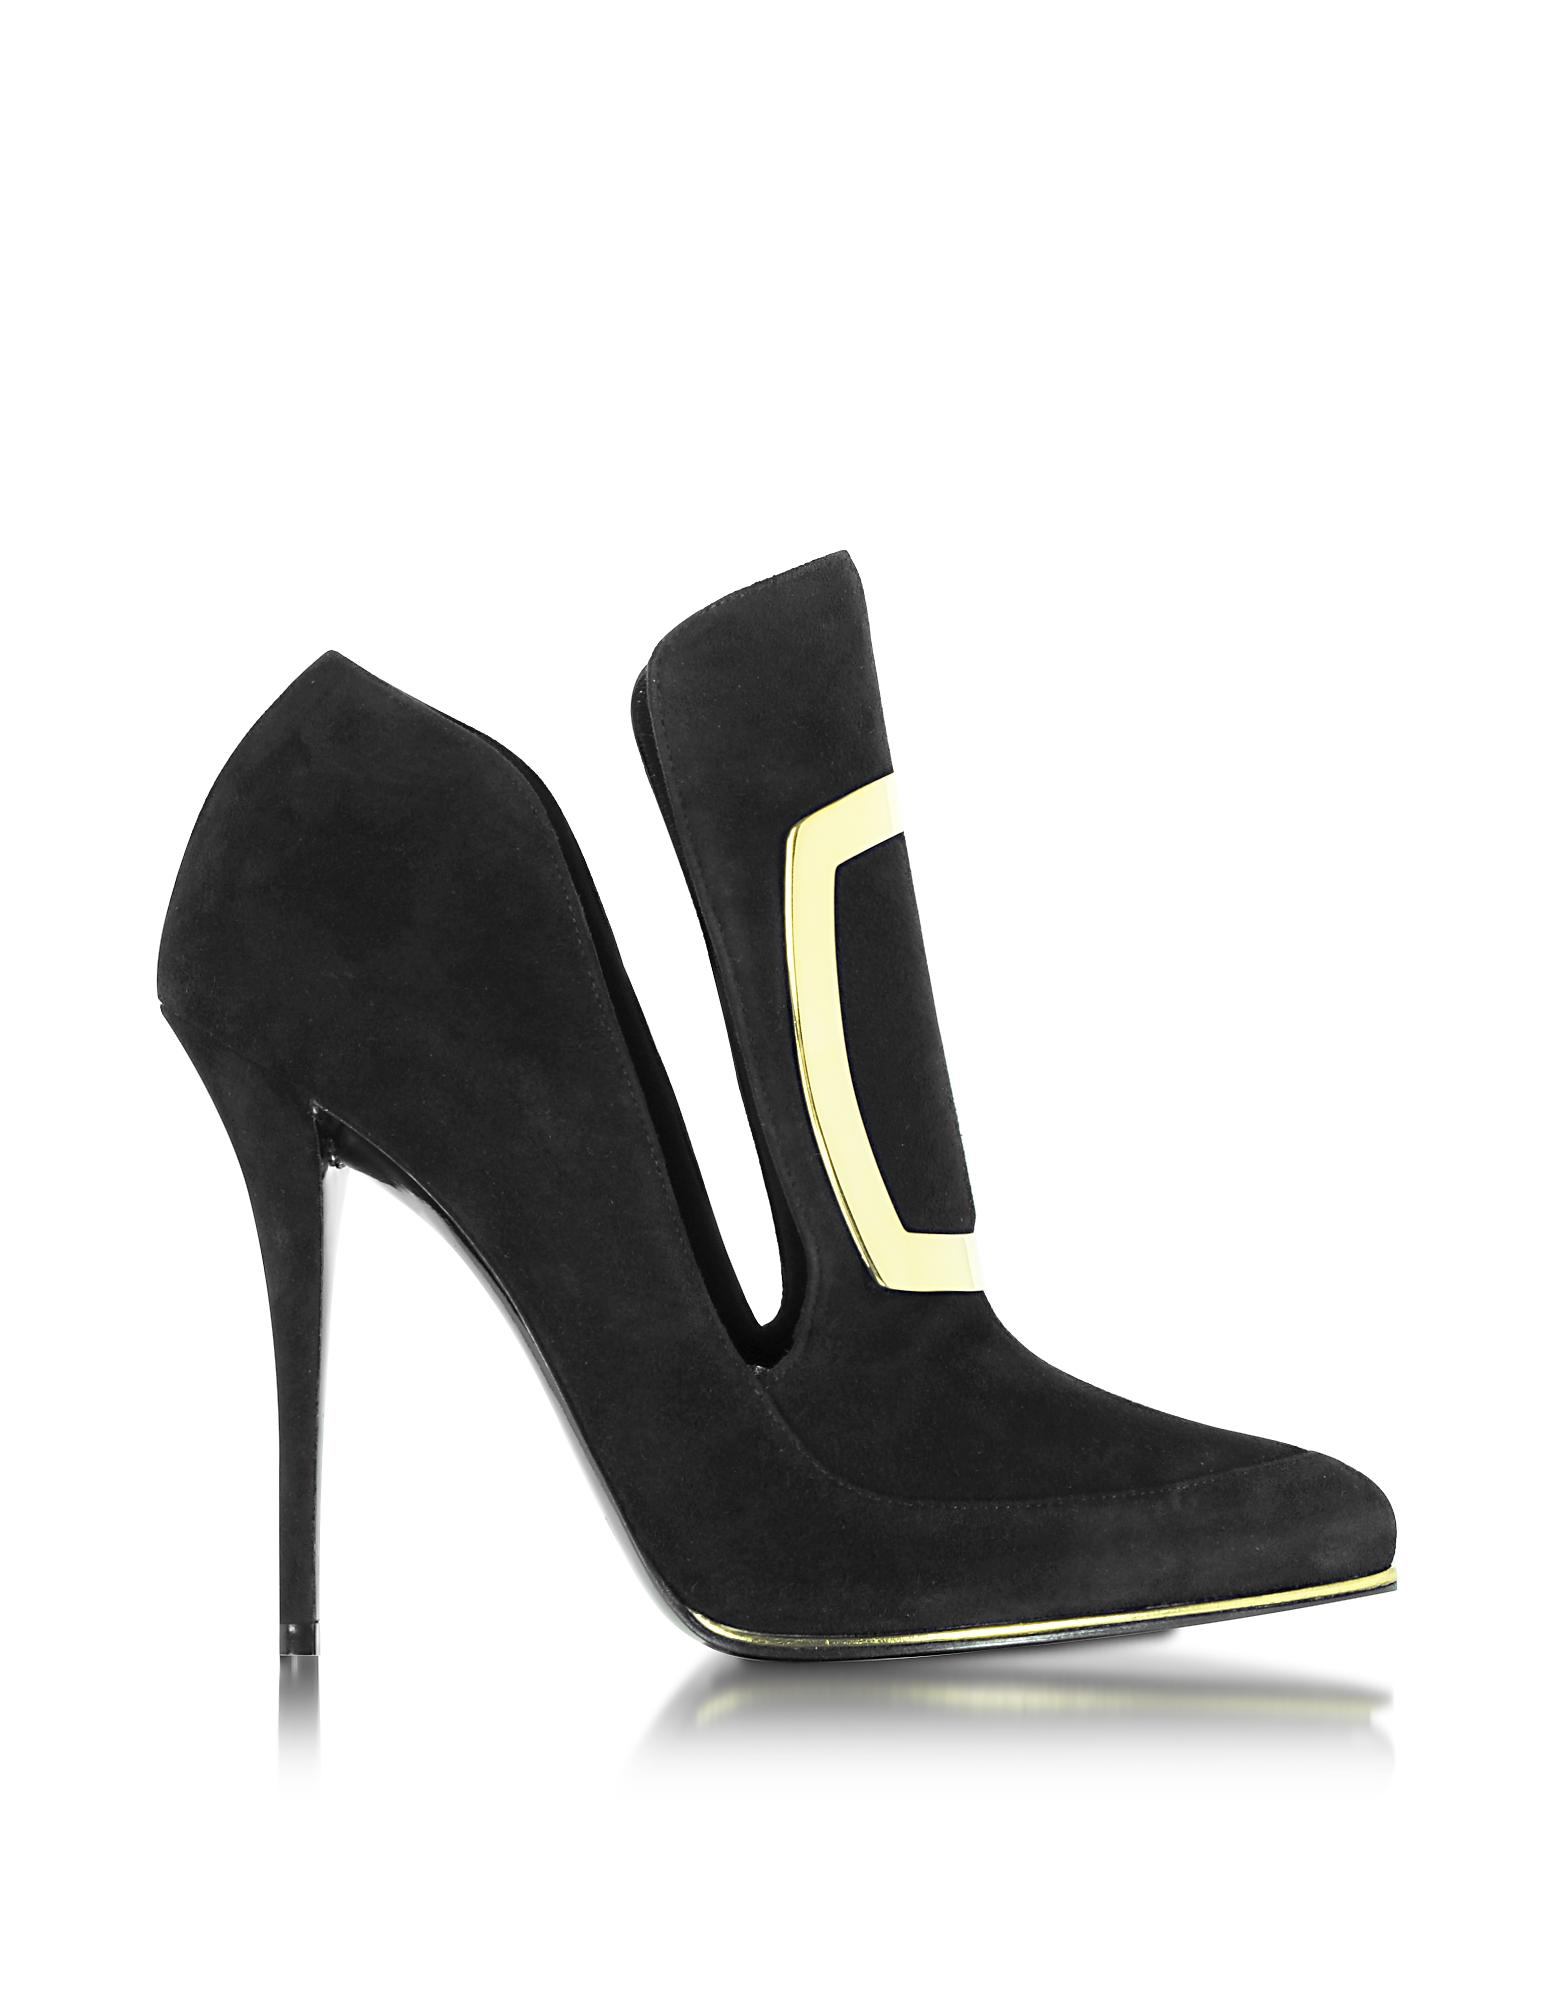 Balmain Designer Shoes, Desiree Black Suede Pump